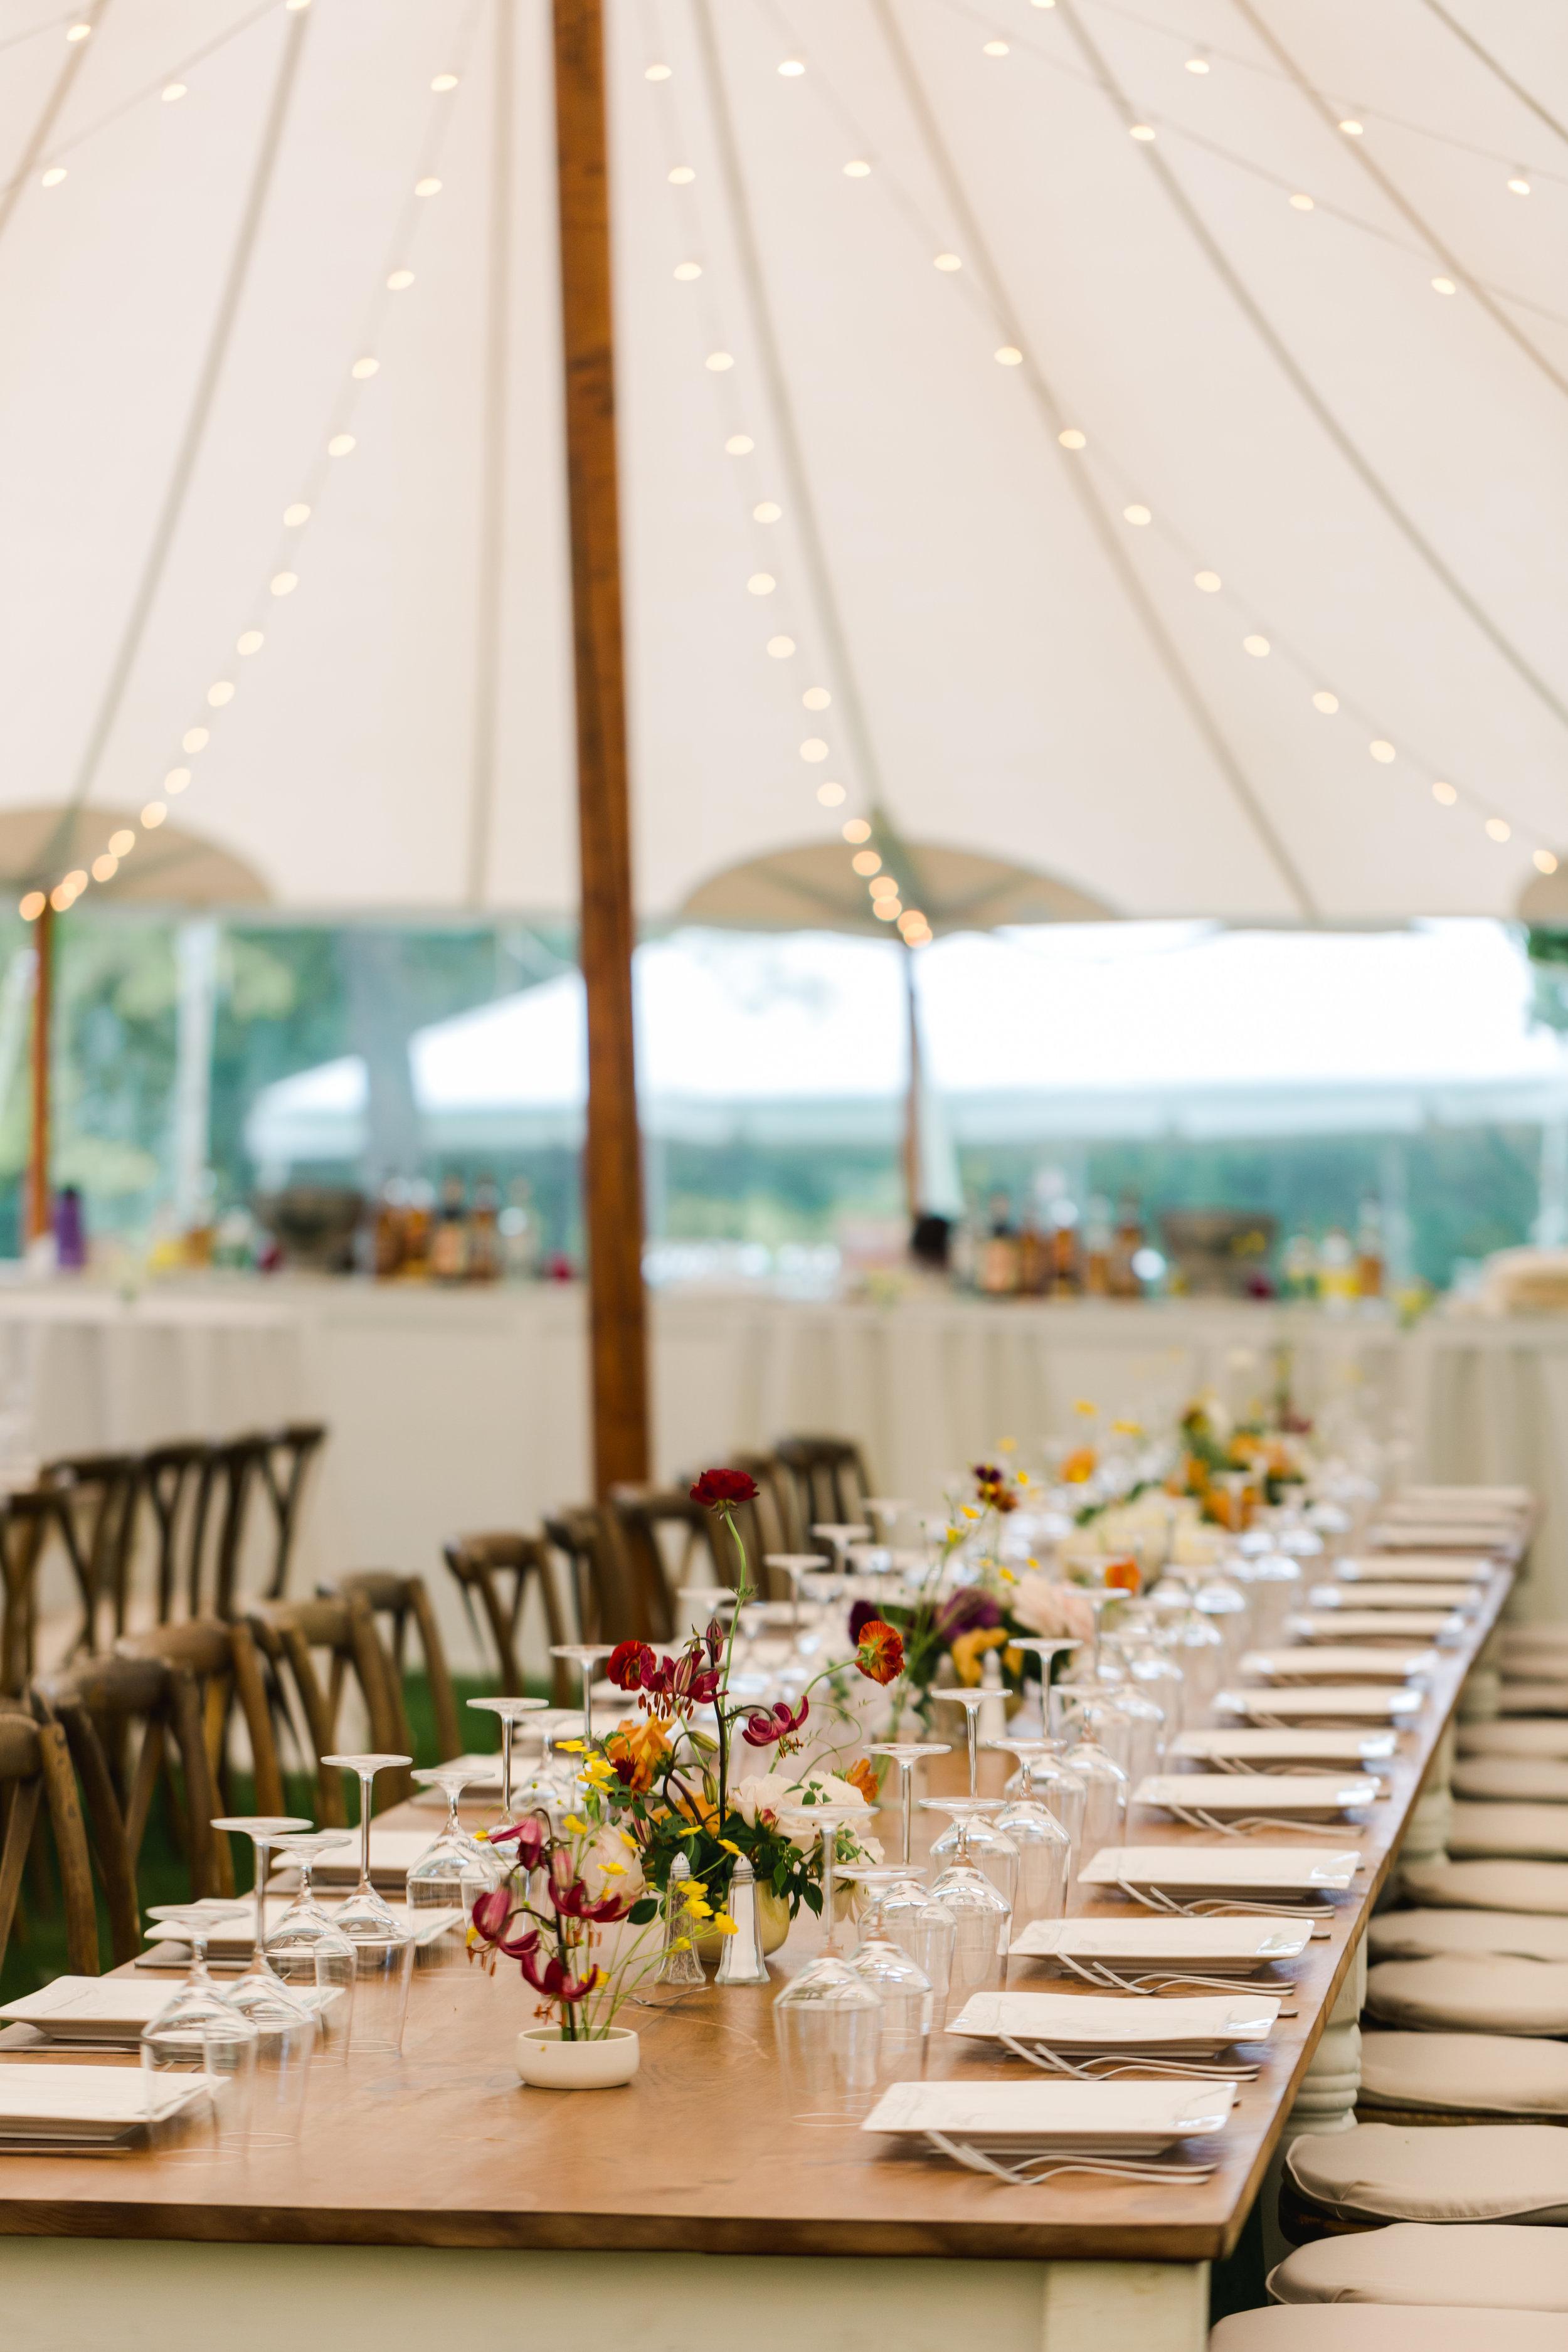 Wedding Planning Packages - Day-Of Wedding Coordinator | SocialMavenBuffalo.com